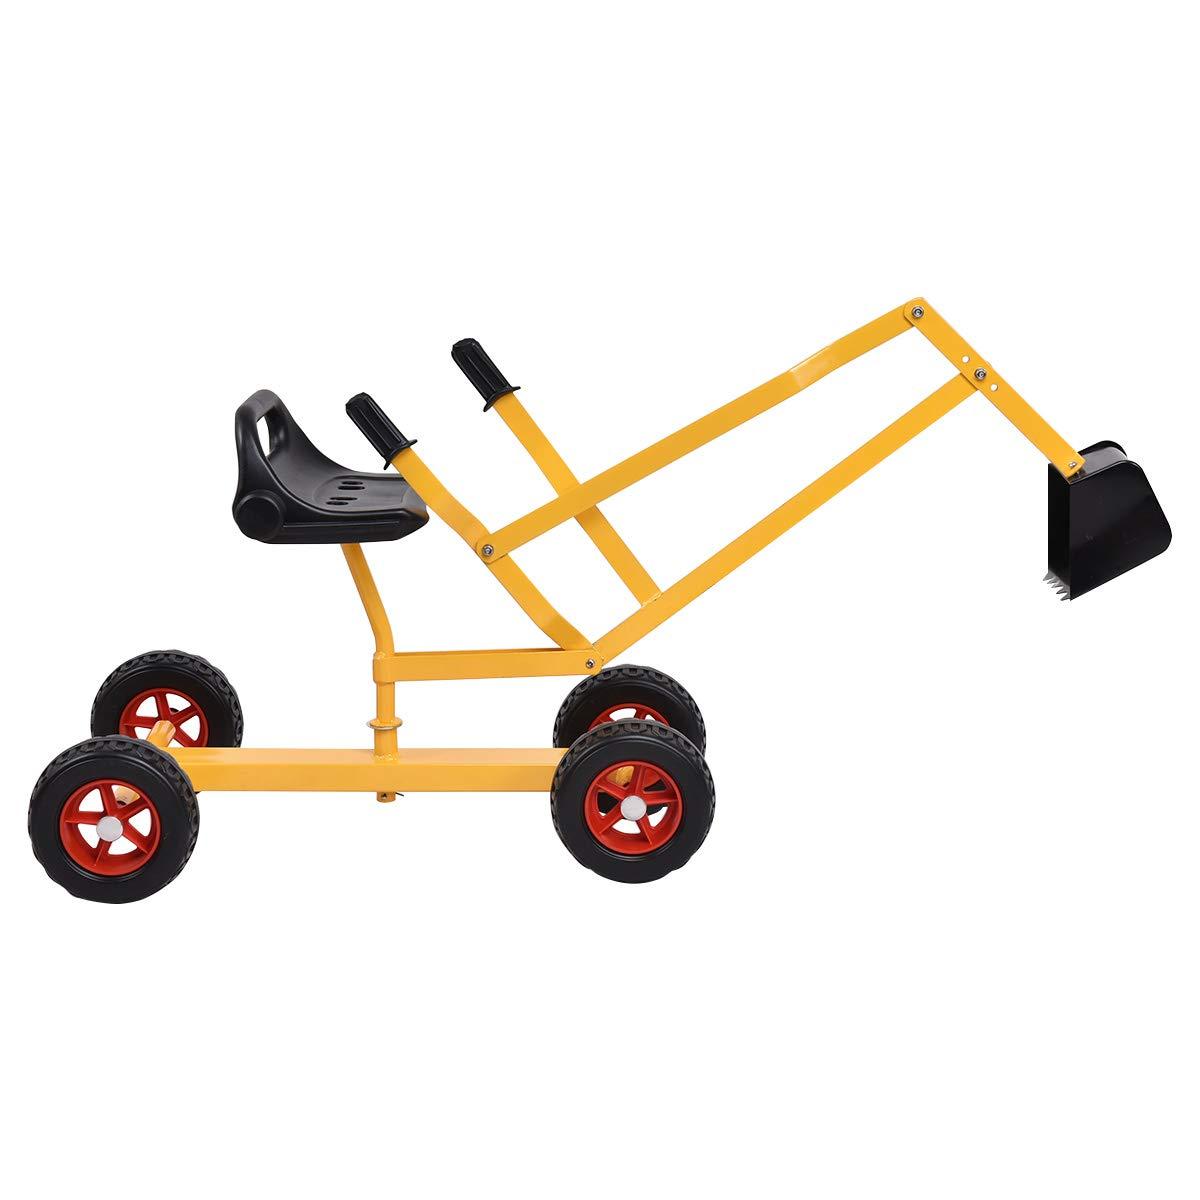 Costzon Kids Ride-on Sand Digger, Outdoor Sandbox Toy, Heavy Duty Steel Digging Scooper Crane (46-Inch Length, 4 Wheel, Yellow) by Costzon